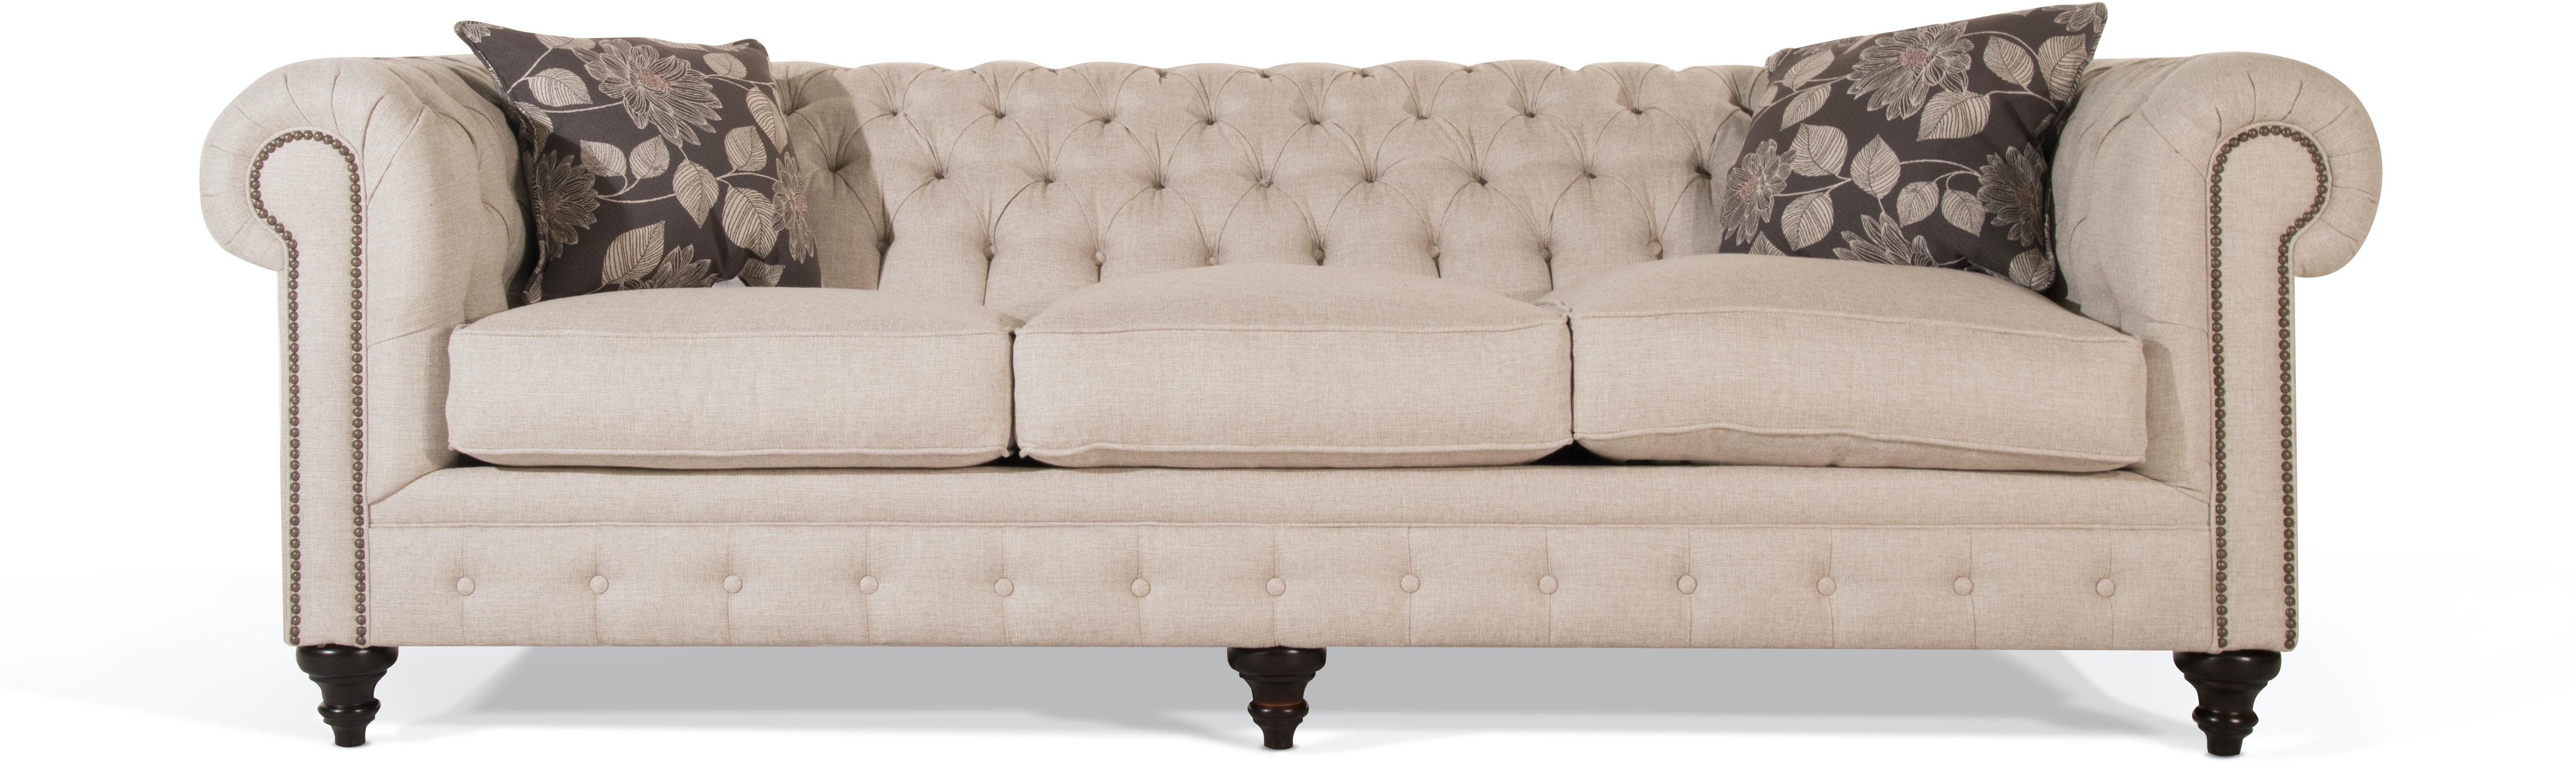 England Living Room Rondell Sofa